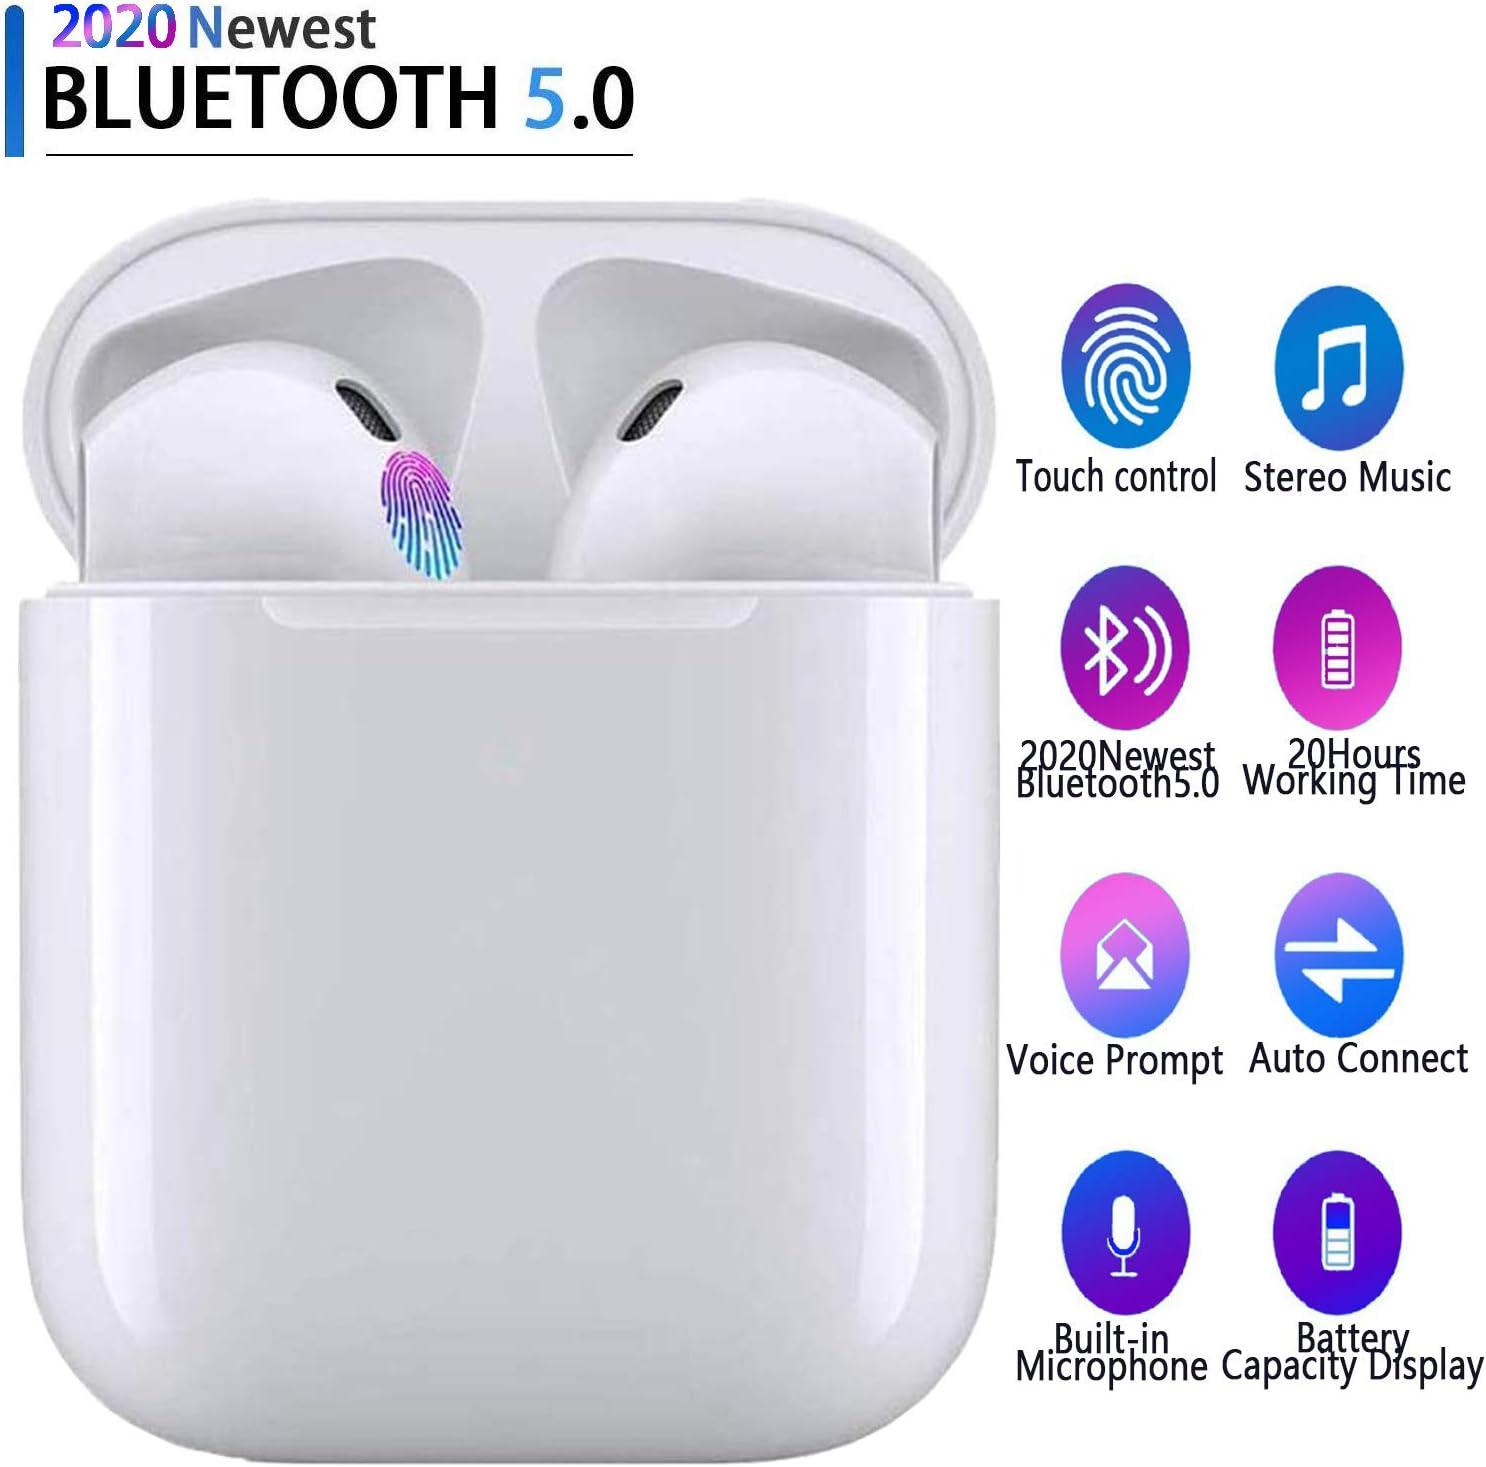 Auriculares Bluetooth 5.0 Auriculares Bluetooth Inalámbrico 650mAh 20H Tiempo De Juego Audio Stereo 3D in Ear con Mic, IPX6 Resistentes al Agua para Apple Airpods Android iPhone Blanco